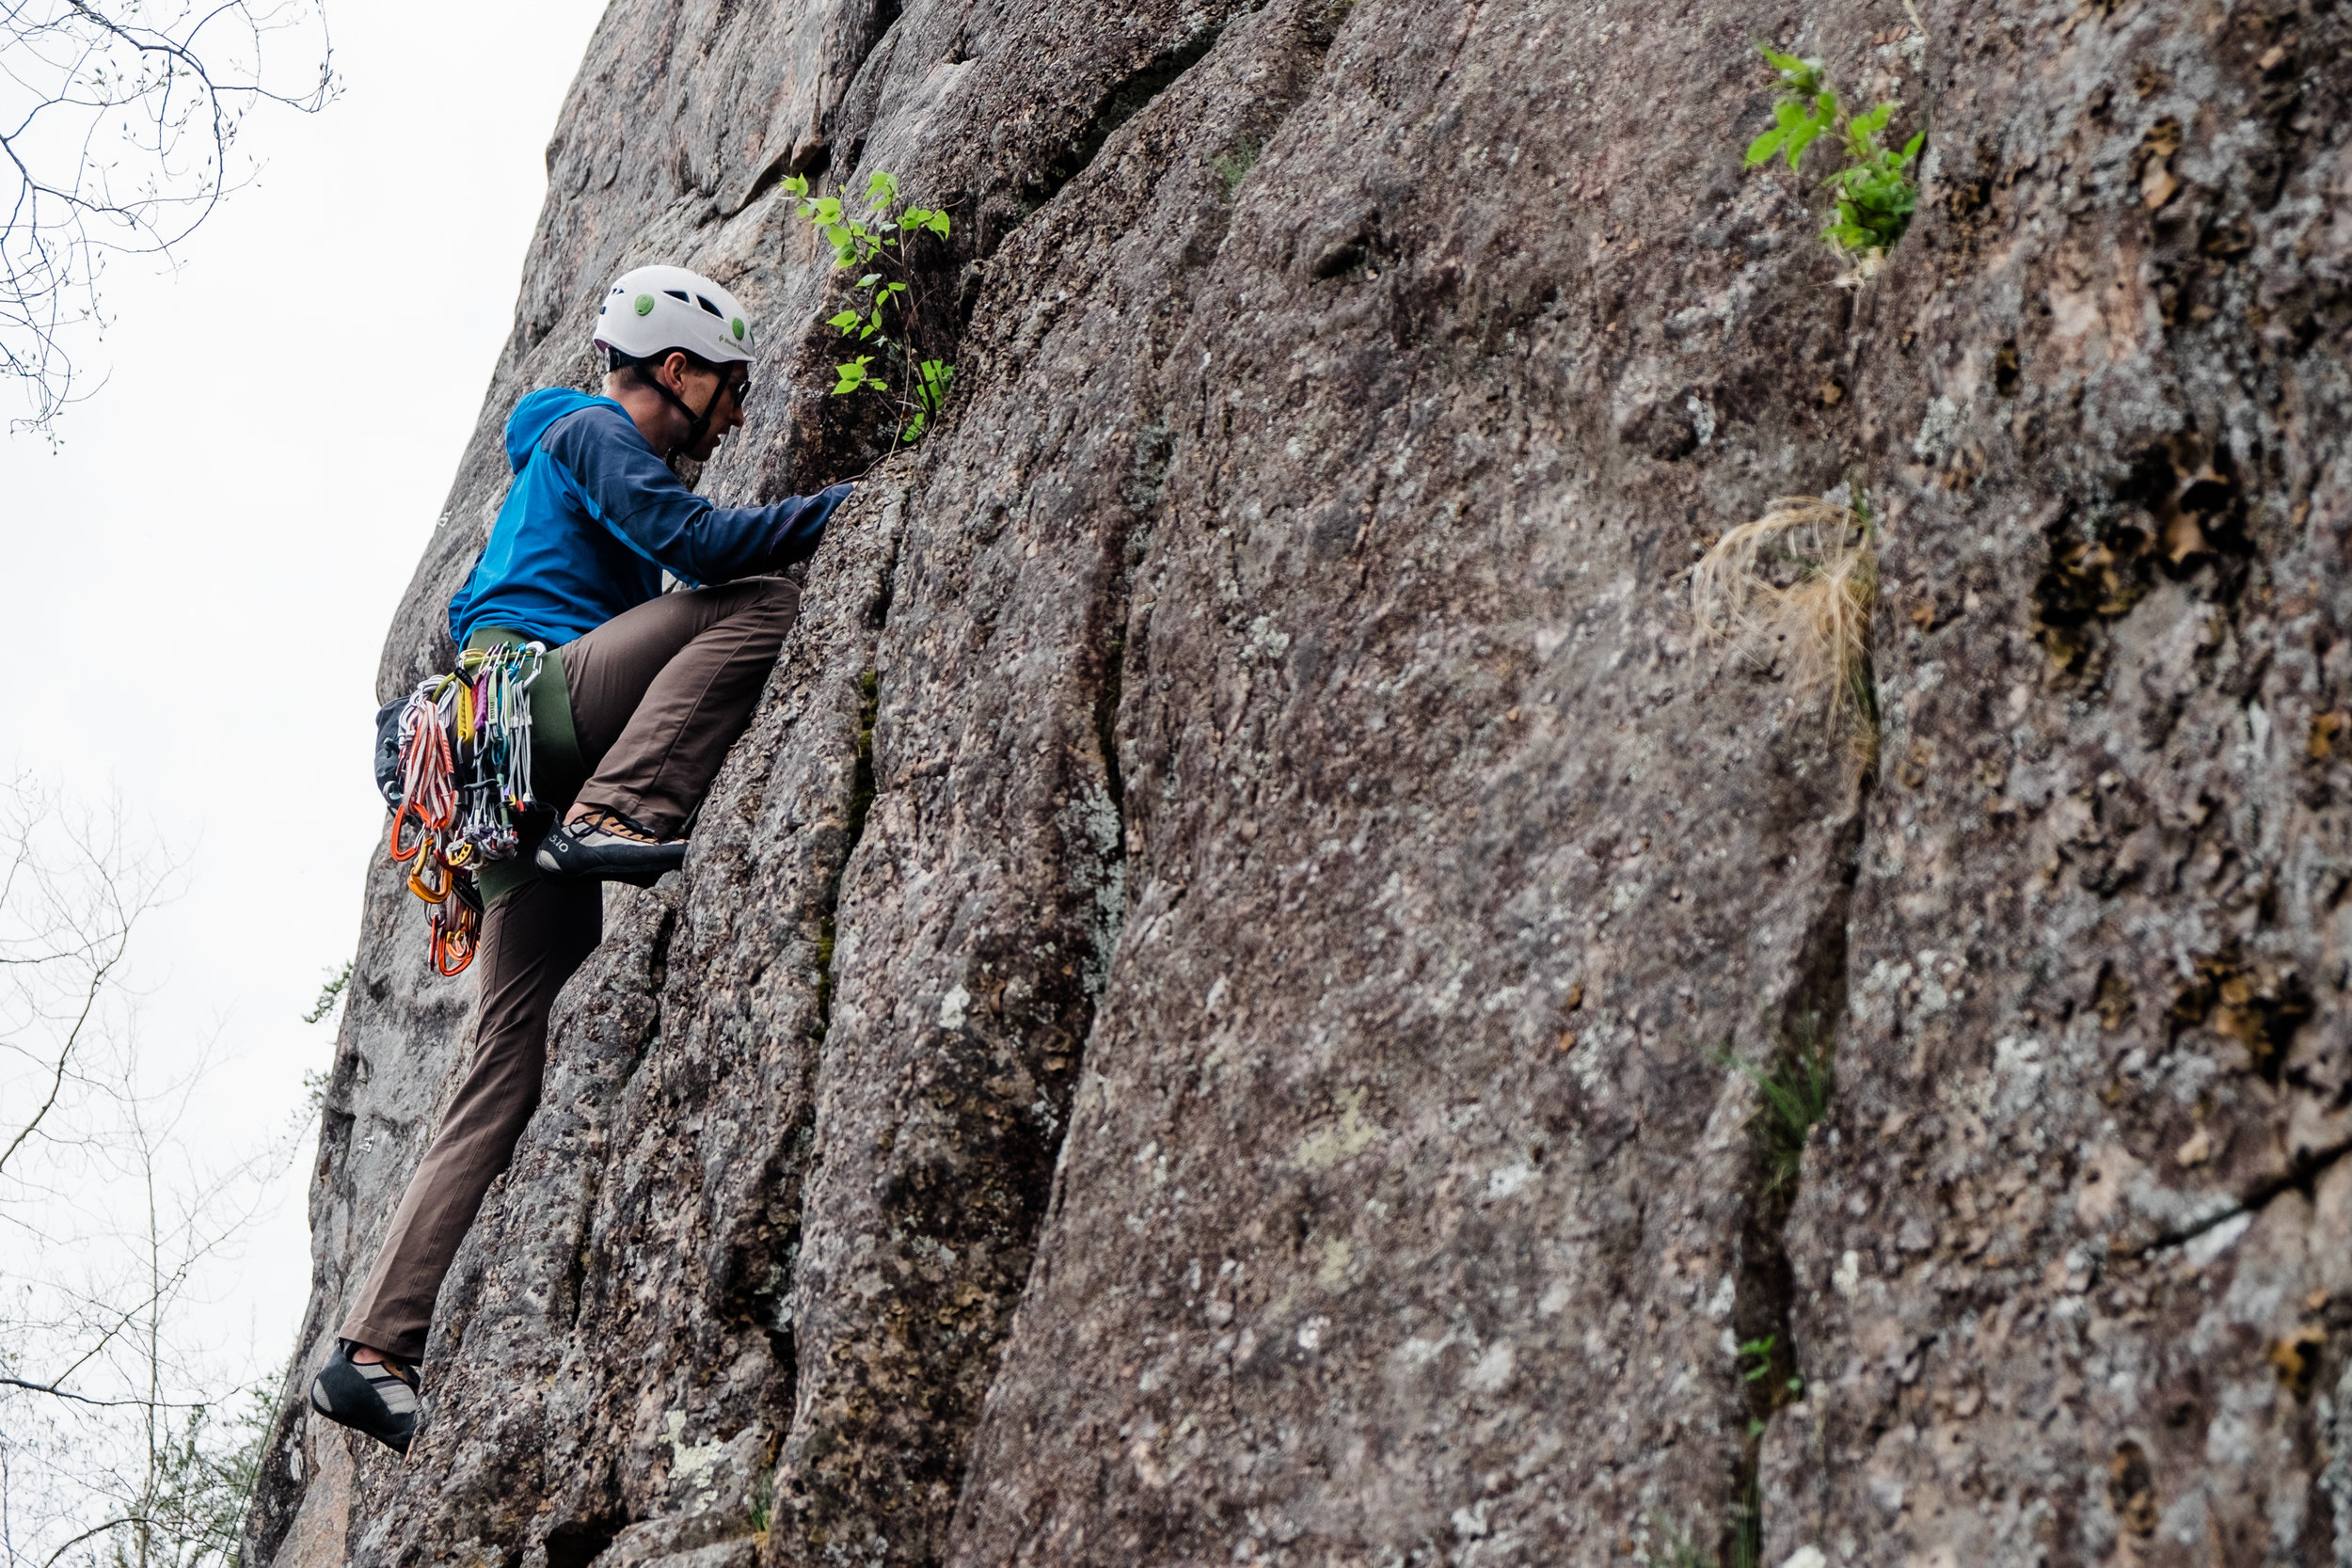 2017-05-20_Jones-Road_Climb_Crump_DSCF2732.jpg